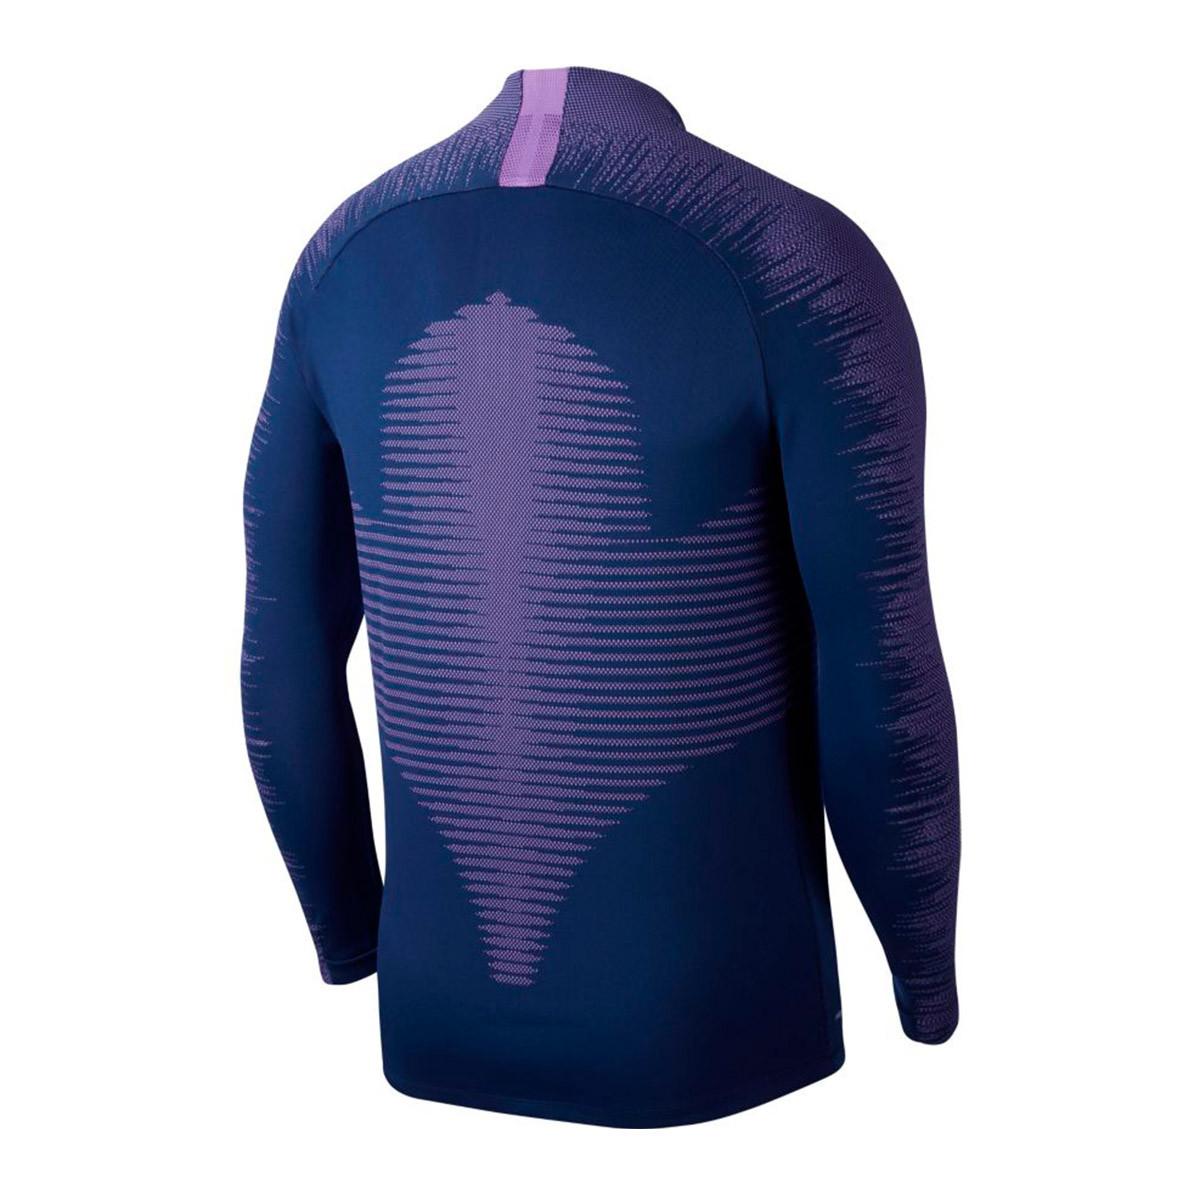 hot sale online 5ddc9 63d3f Camiseta Tottenham Hotspur Vapornkit Dril 2019-2020 Binary blue-Action grape